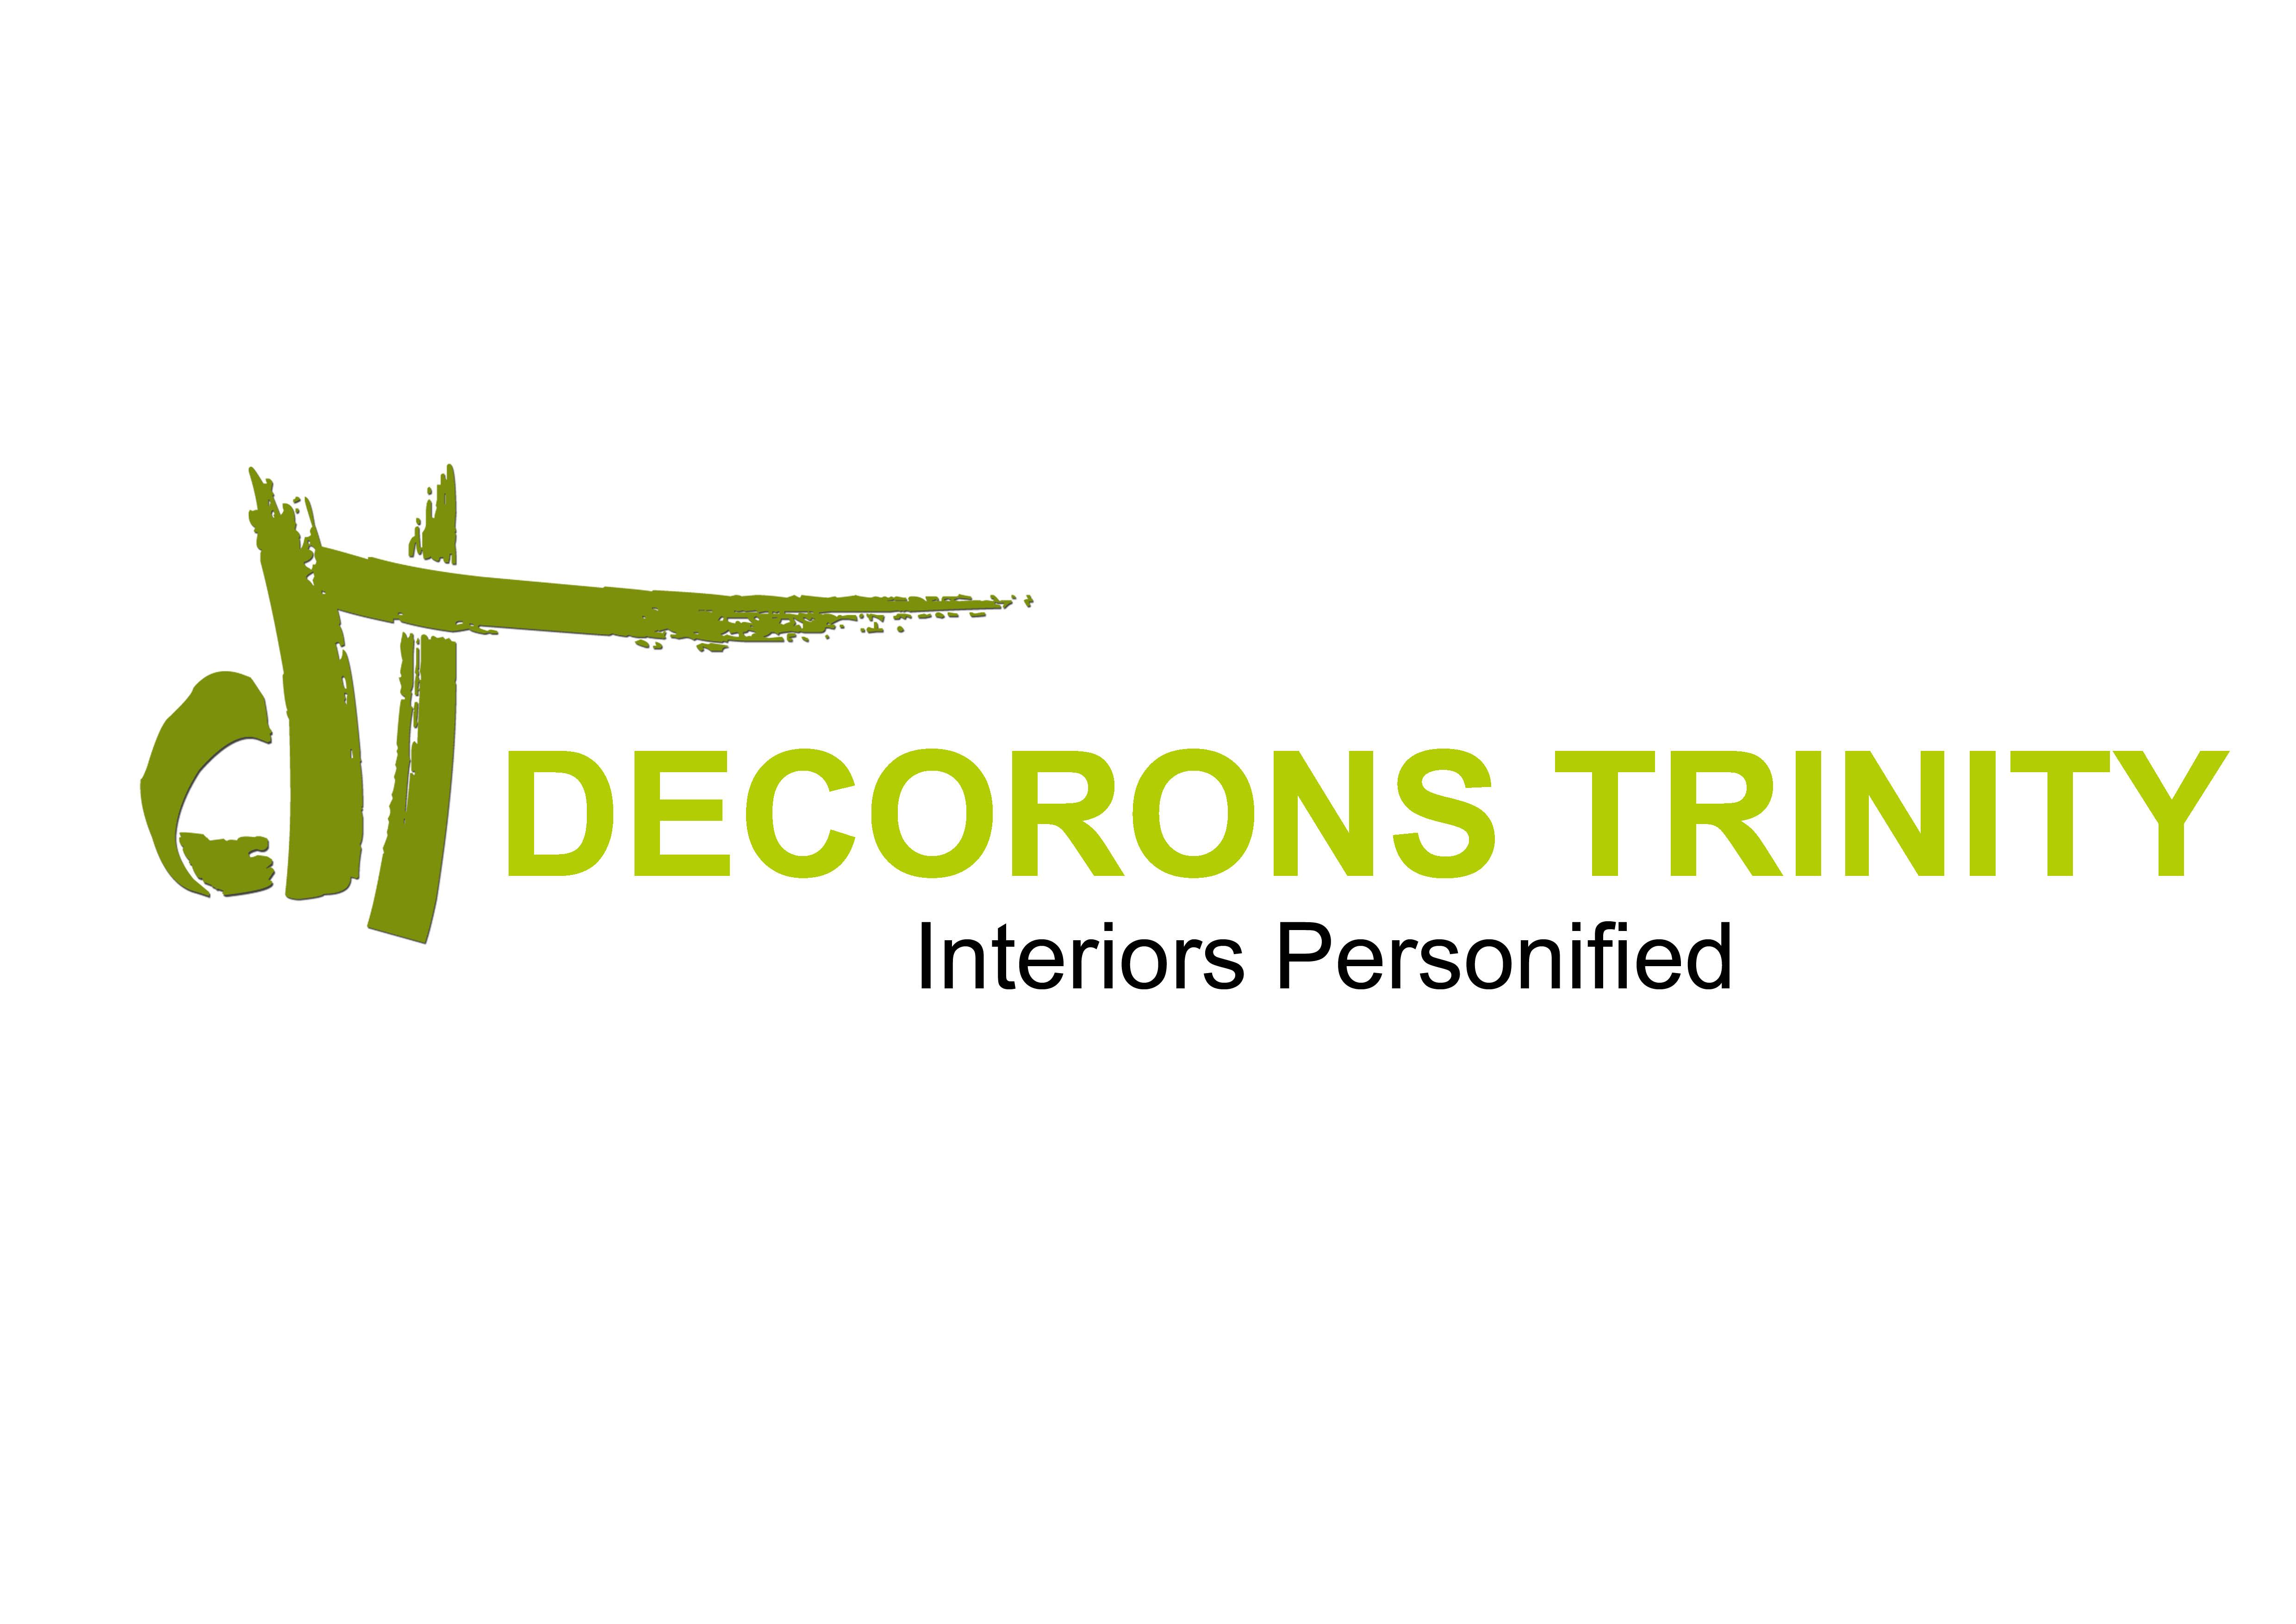 Decorons Trinity